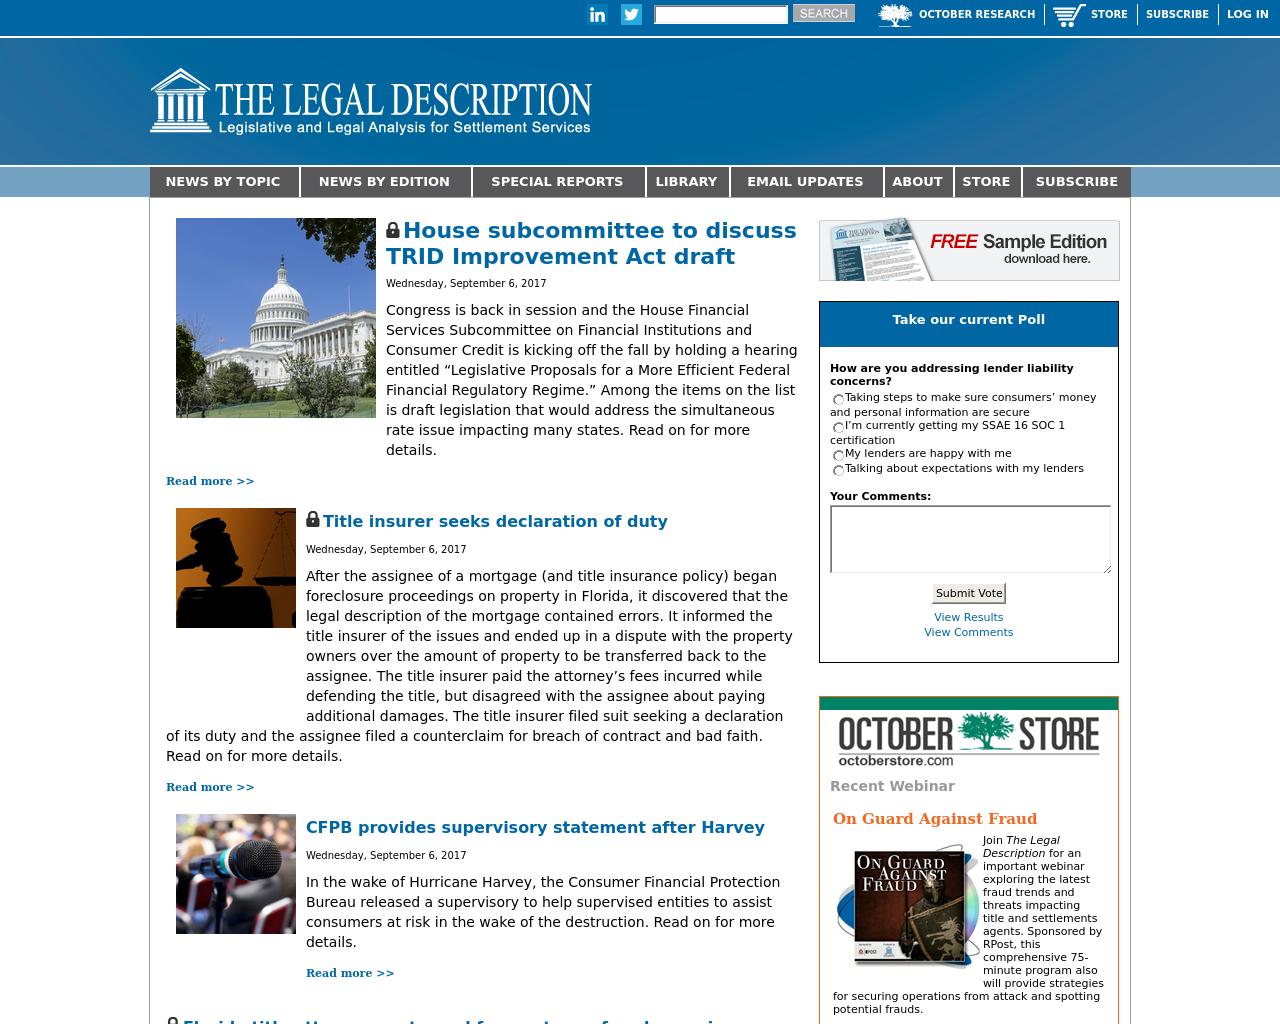 The-Legal-Description-Advertising-Reviews-Pricing